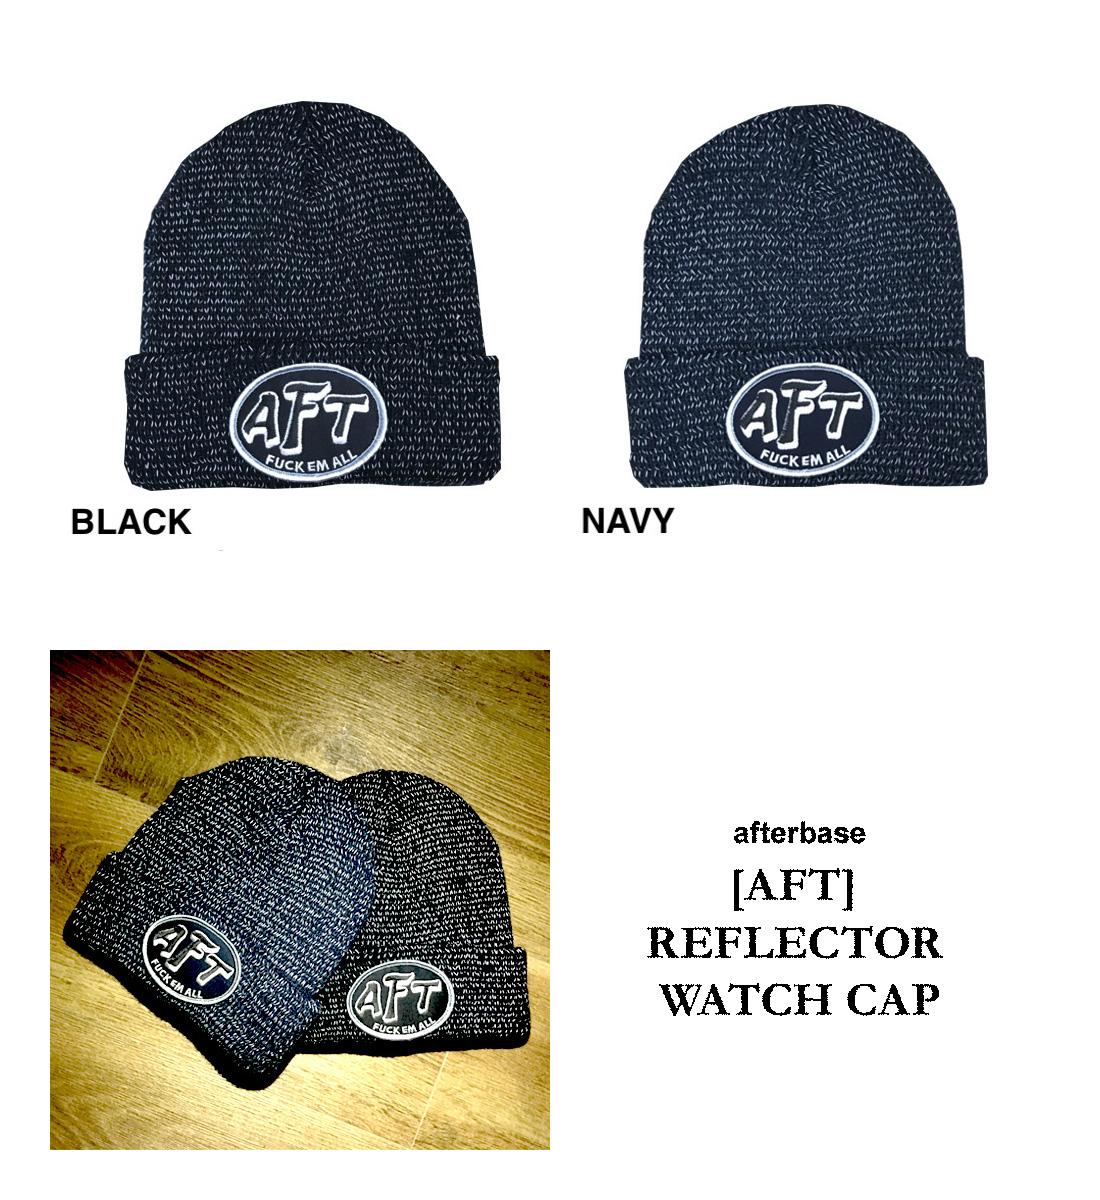 0ac7a143aae aftbs  afterbase  AFT  REFLECTOR WATCH CAP